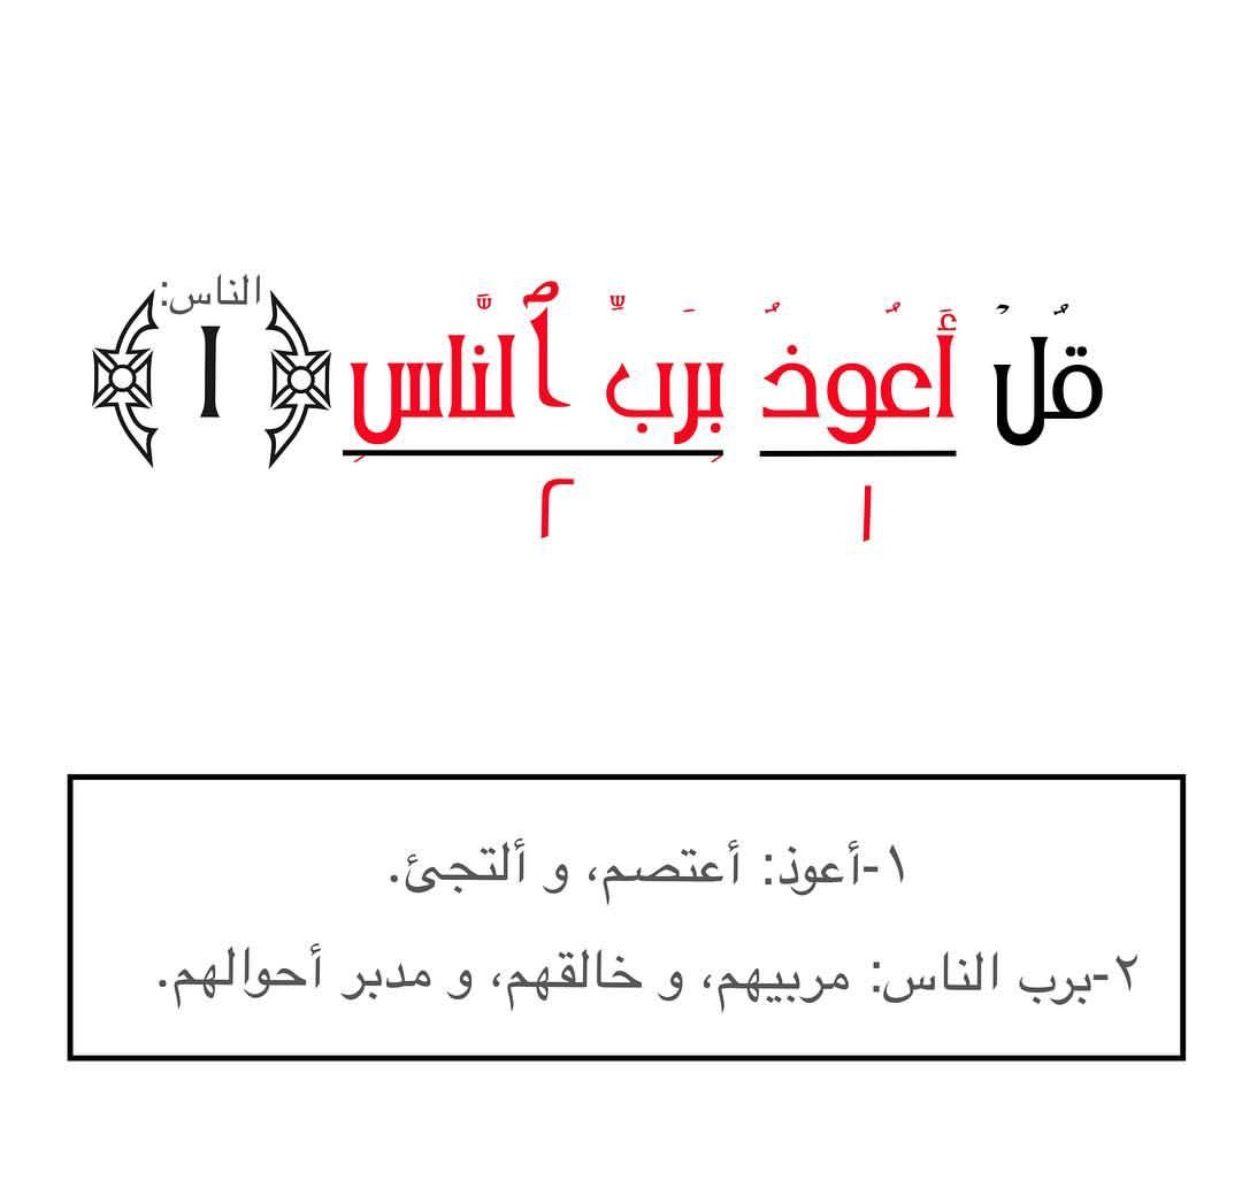 Islam Muslim Quran Verse Quotes Allah Alhamdulillah Quotes Verse Math